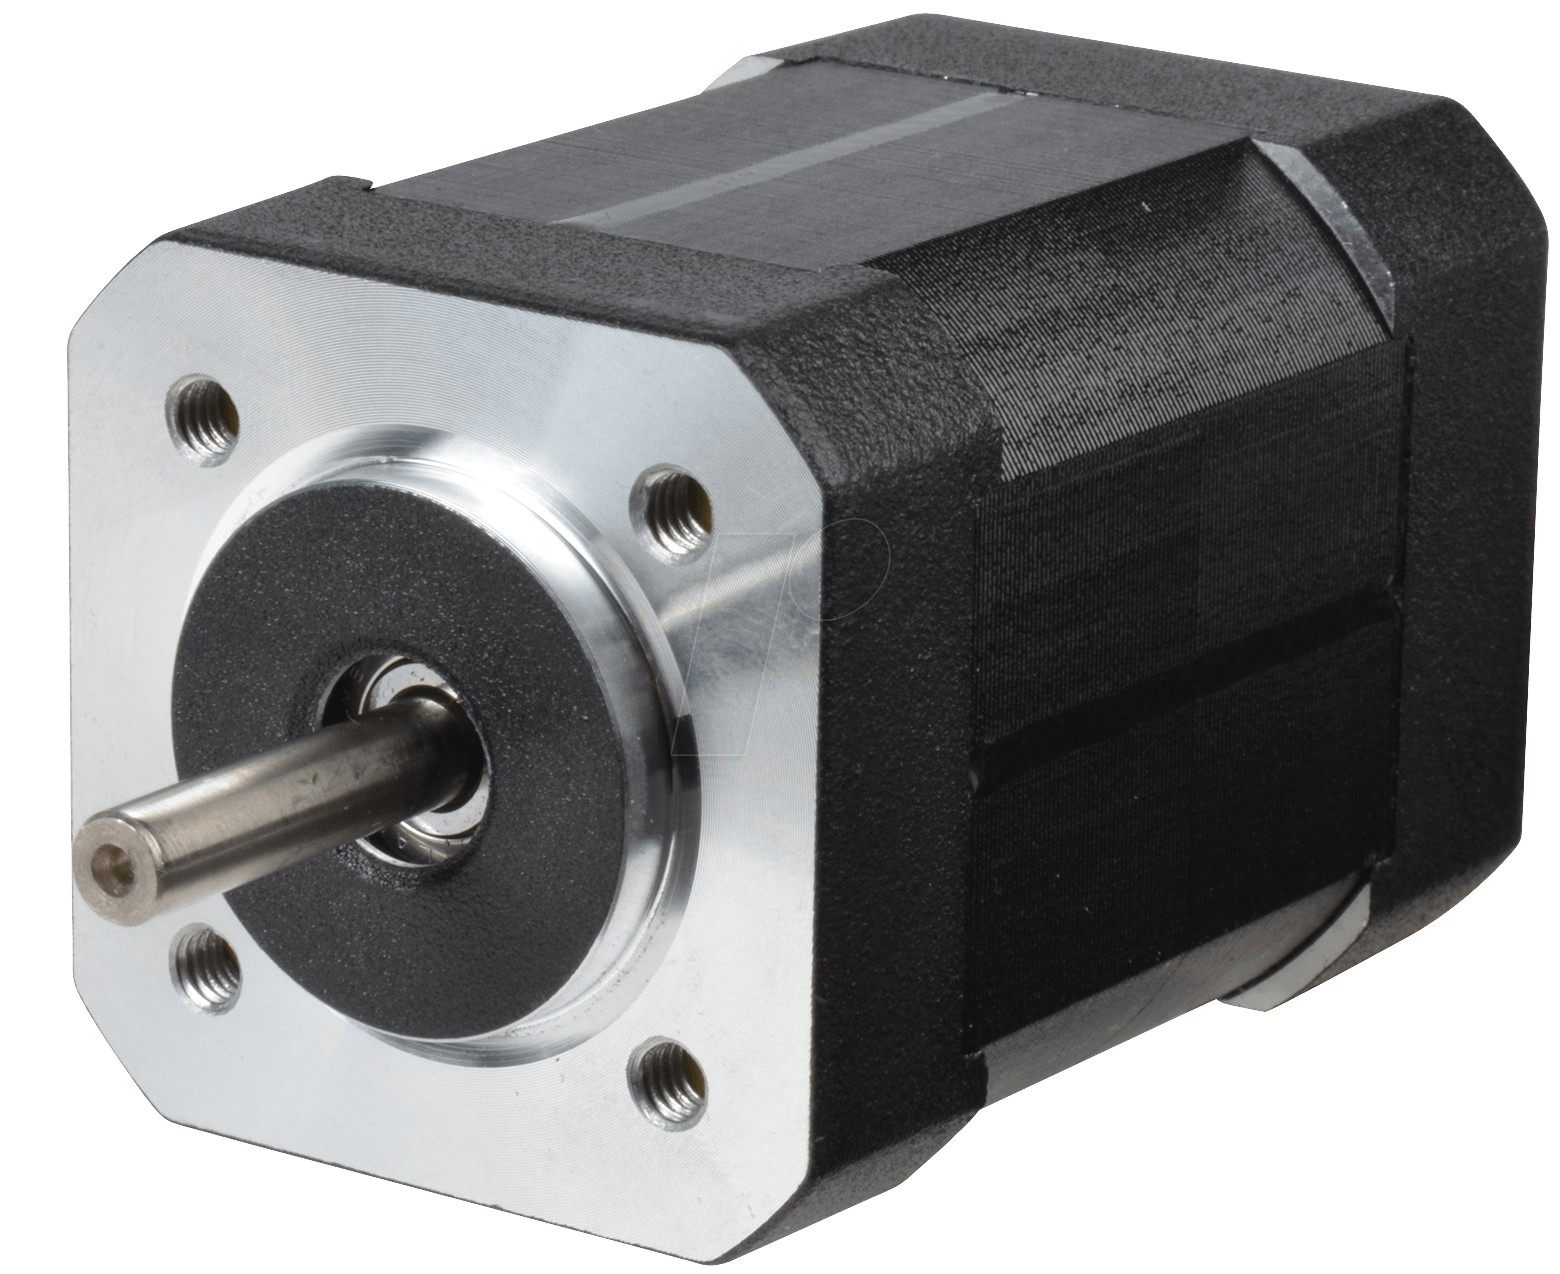 Qbl4208 61 04 brushless dc motor 42x42mm length 61mm at for Brushless dc electric motor